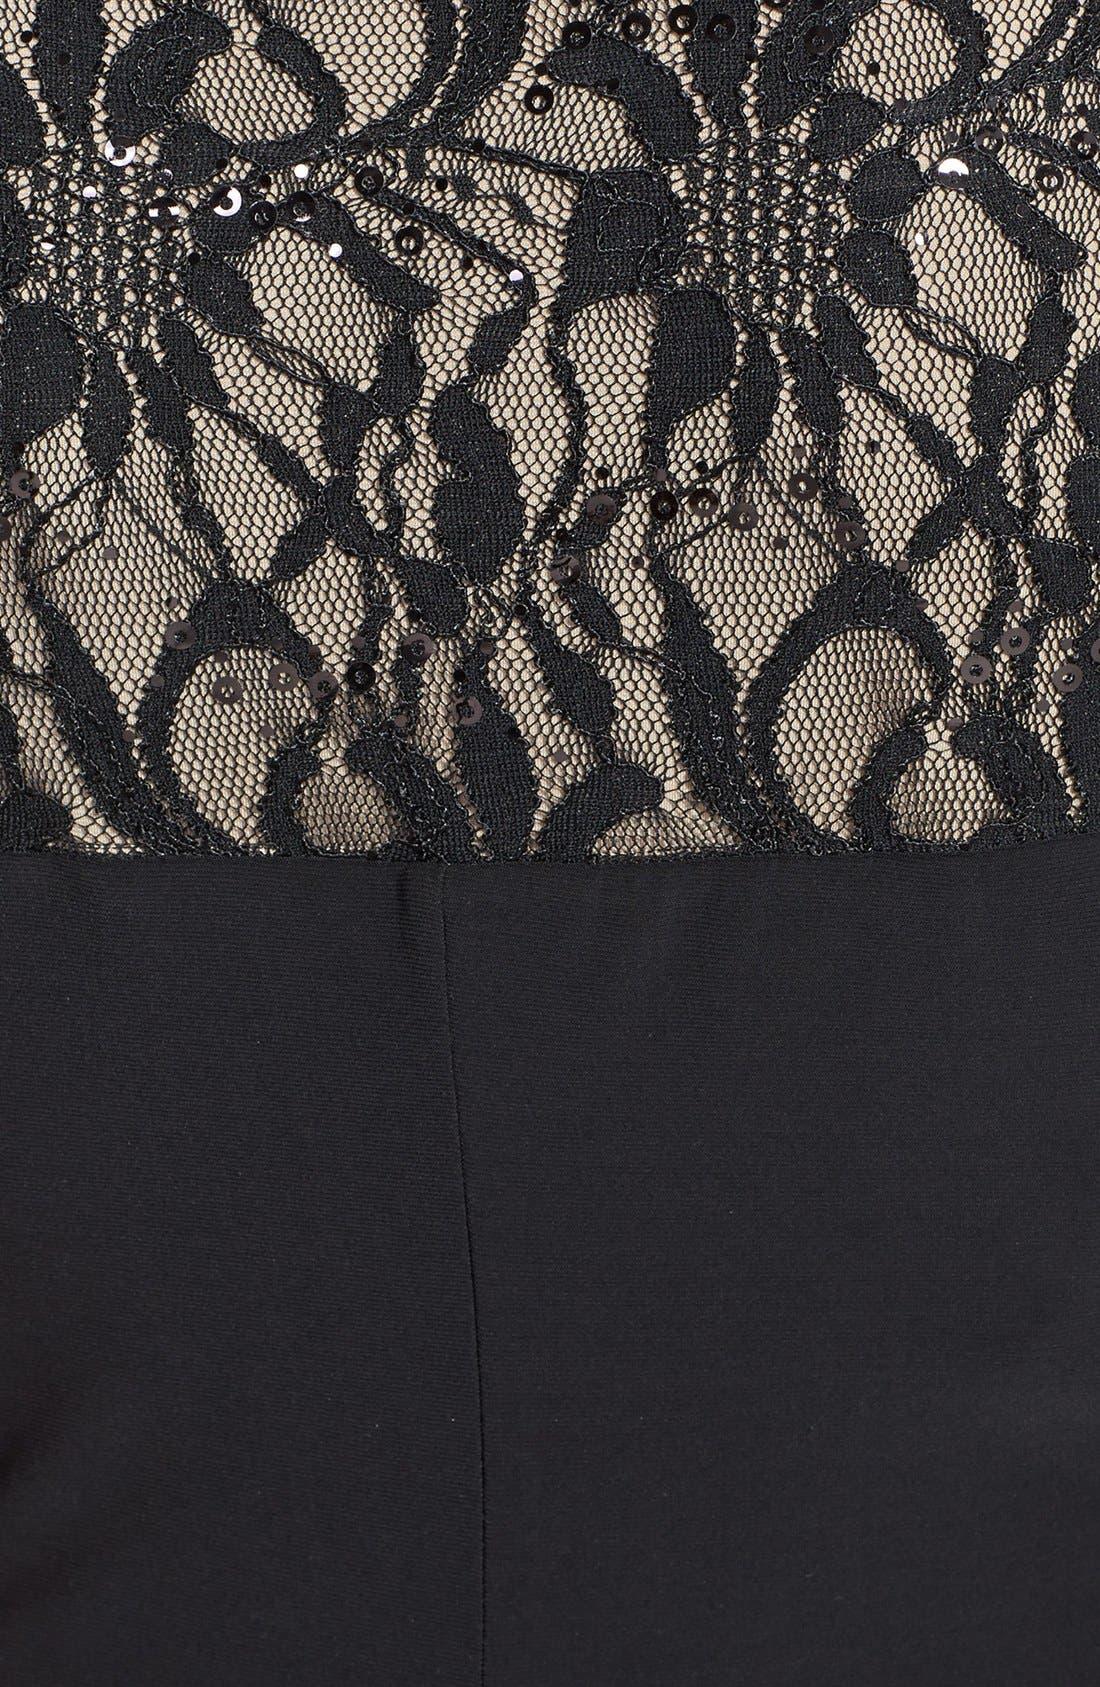 Alternate Image 3  - Lauren Ralph Lauren Lace & Jersey Sheath Dress